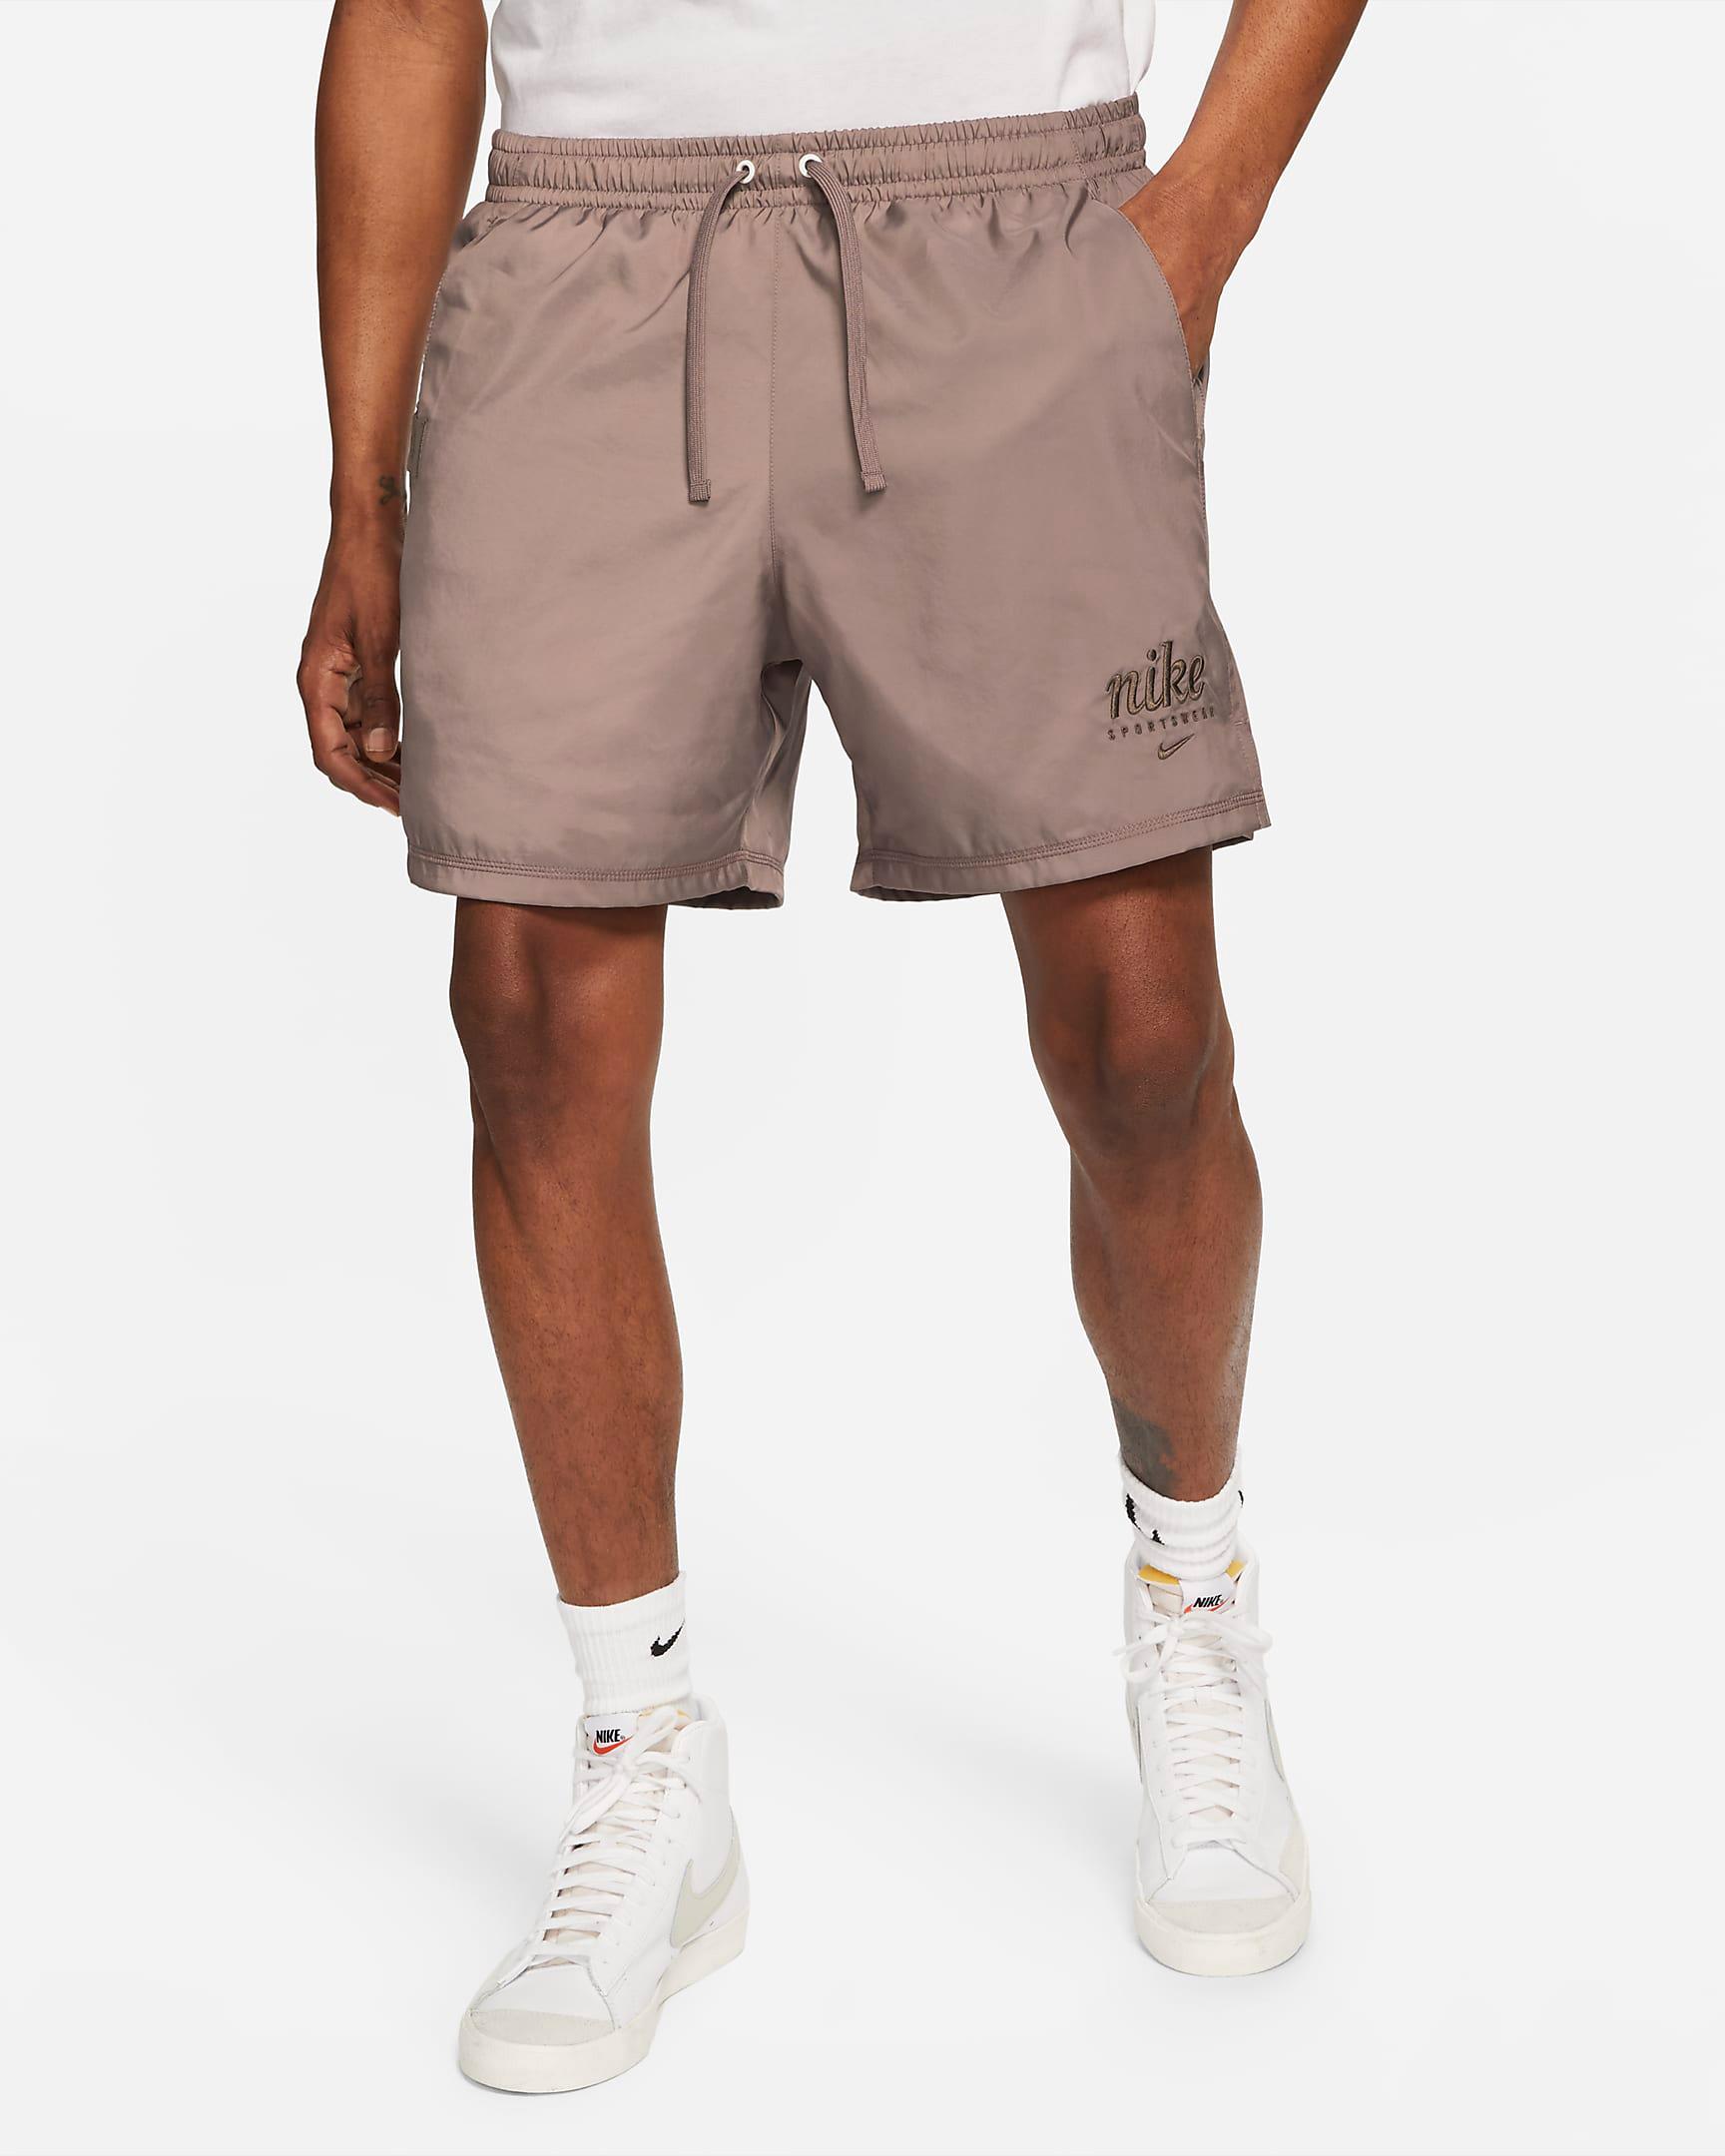 nike-taupe-haze-woven-shorts